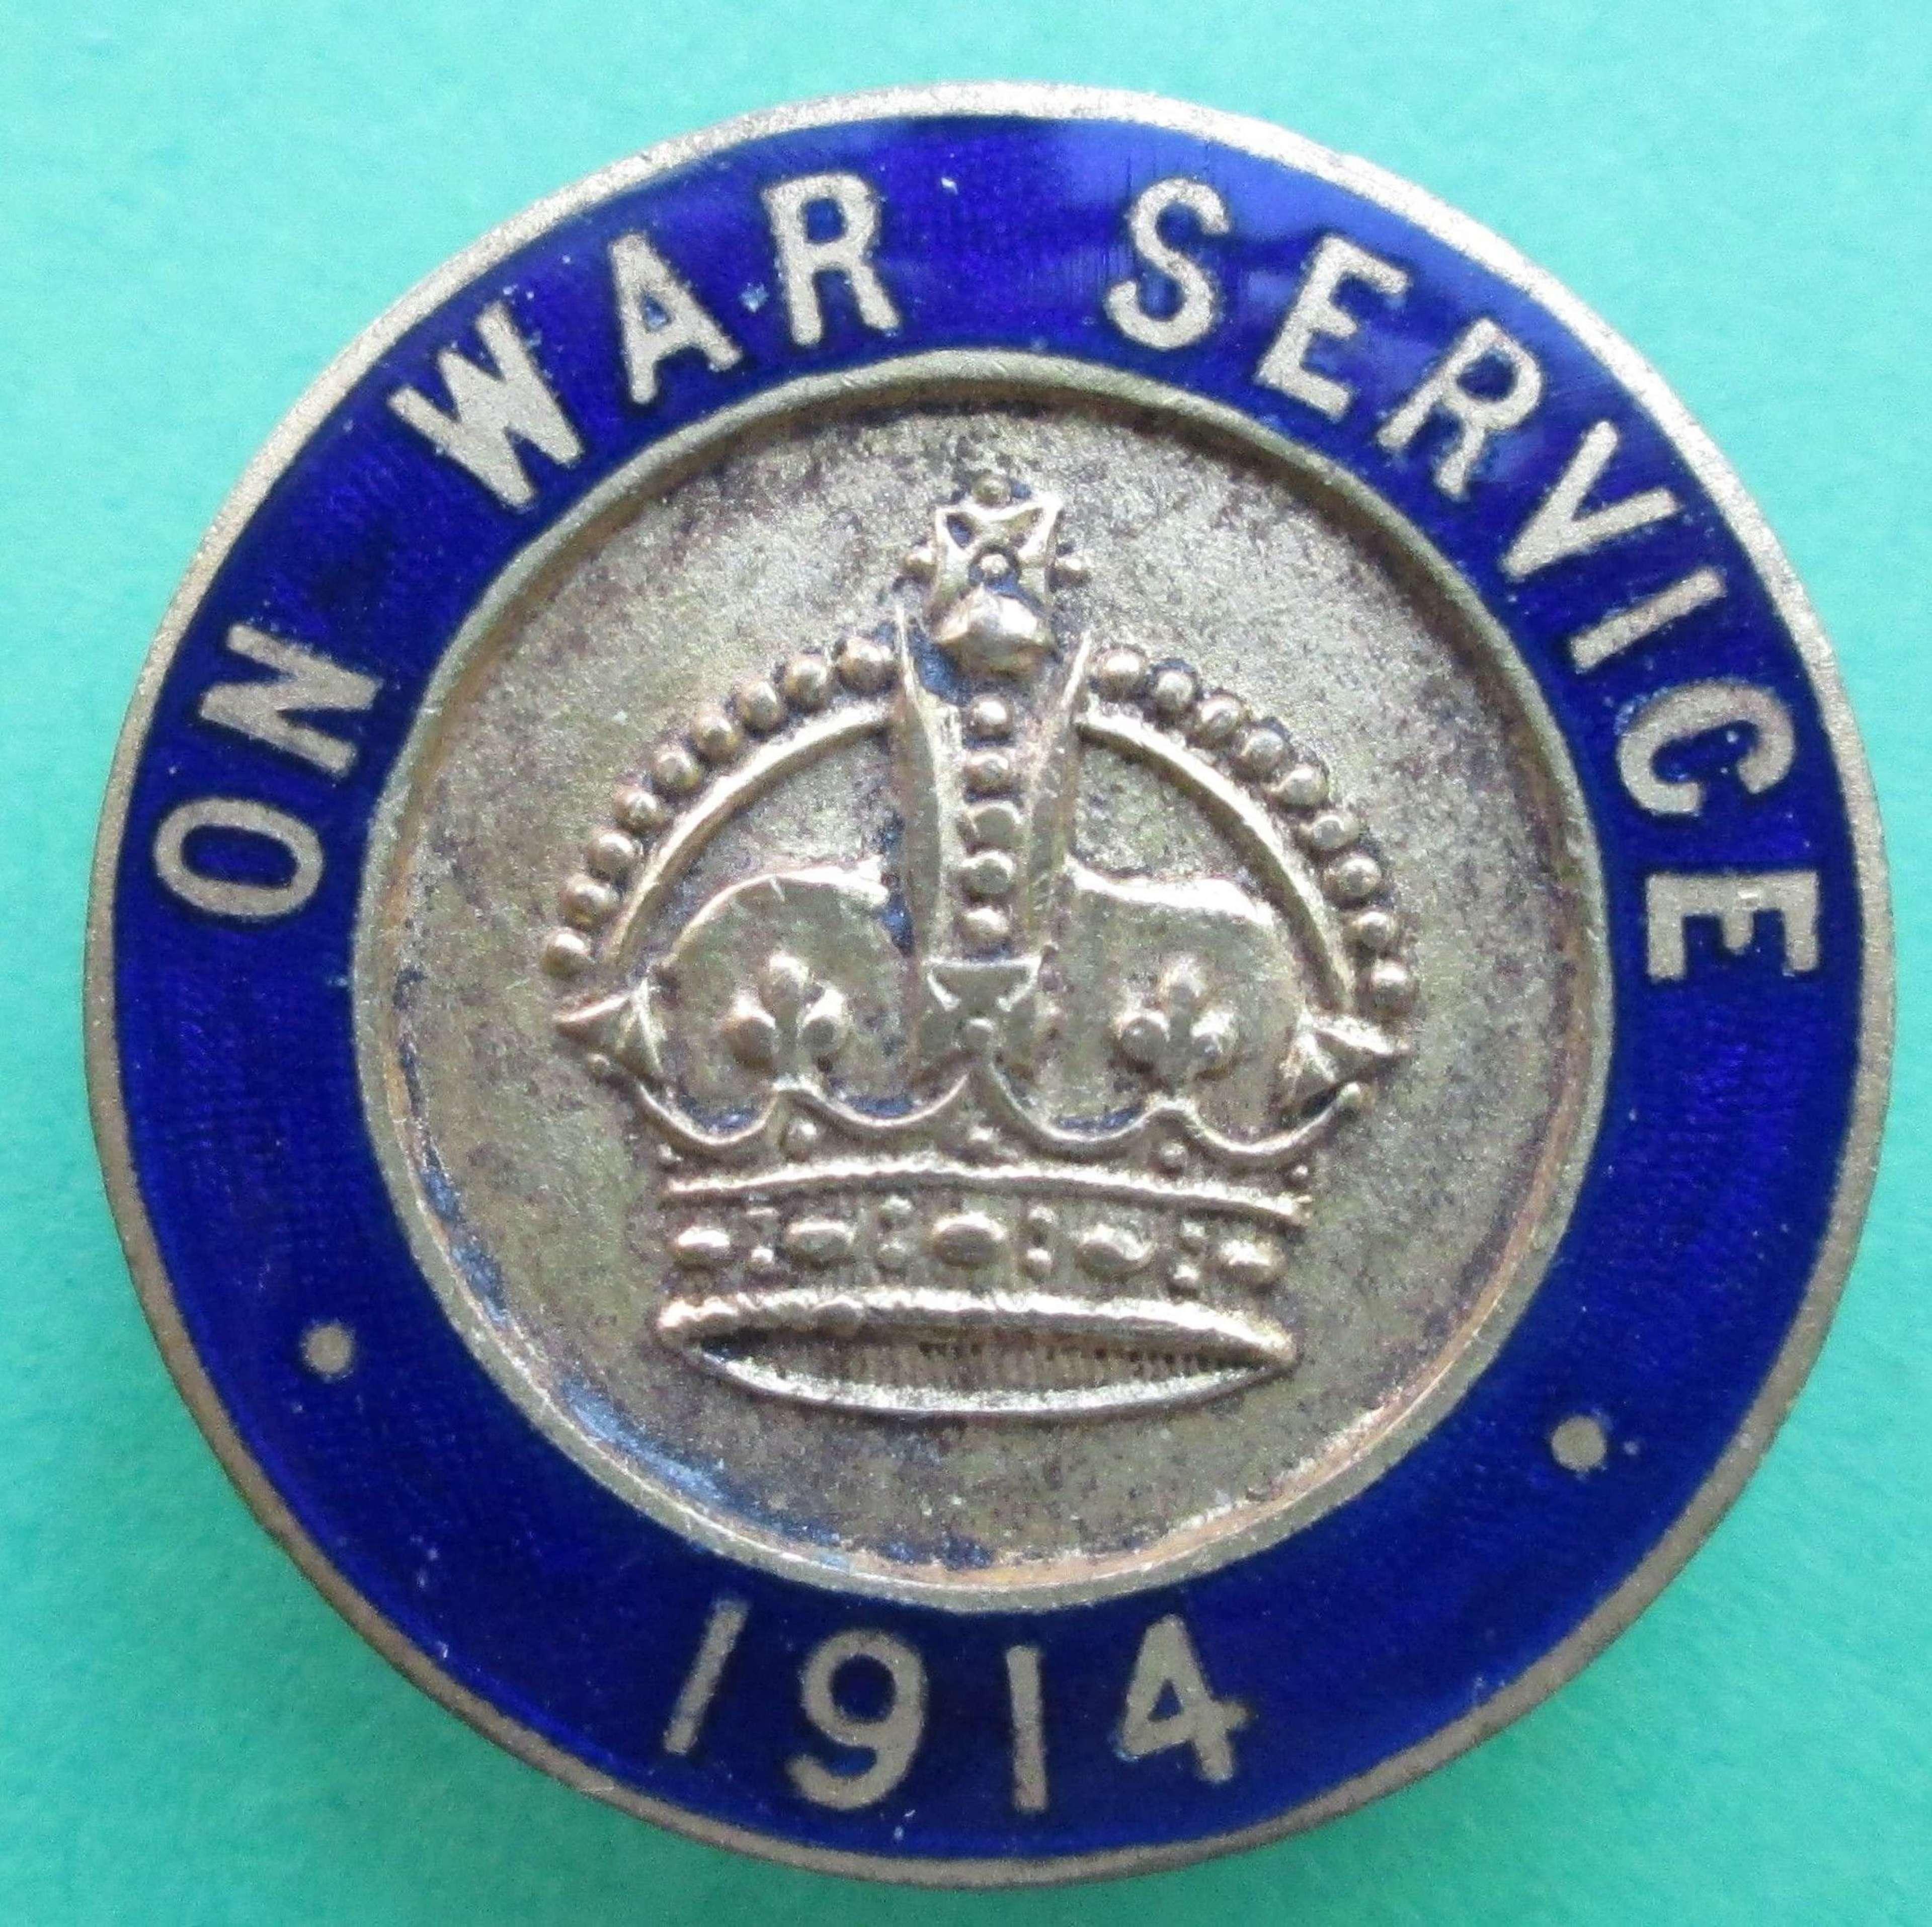 1914 ON WAR SERVICE BADGE